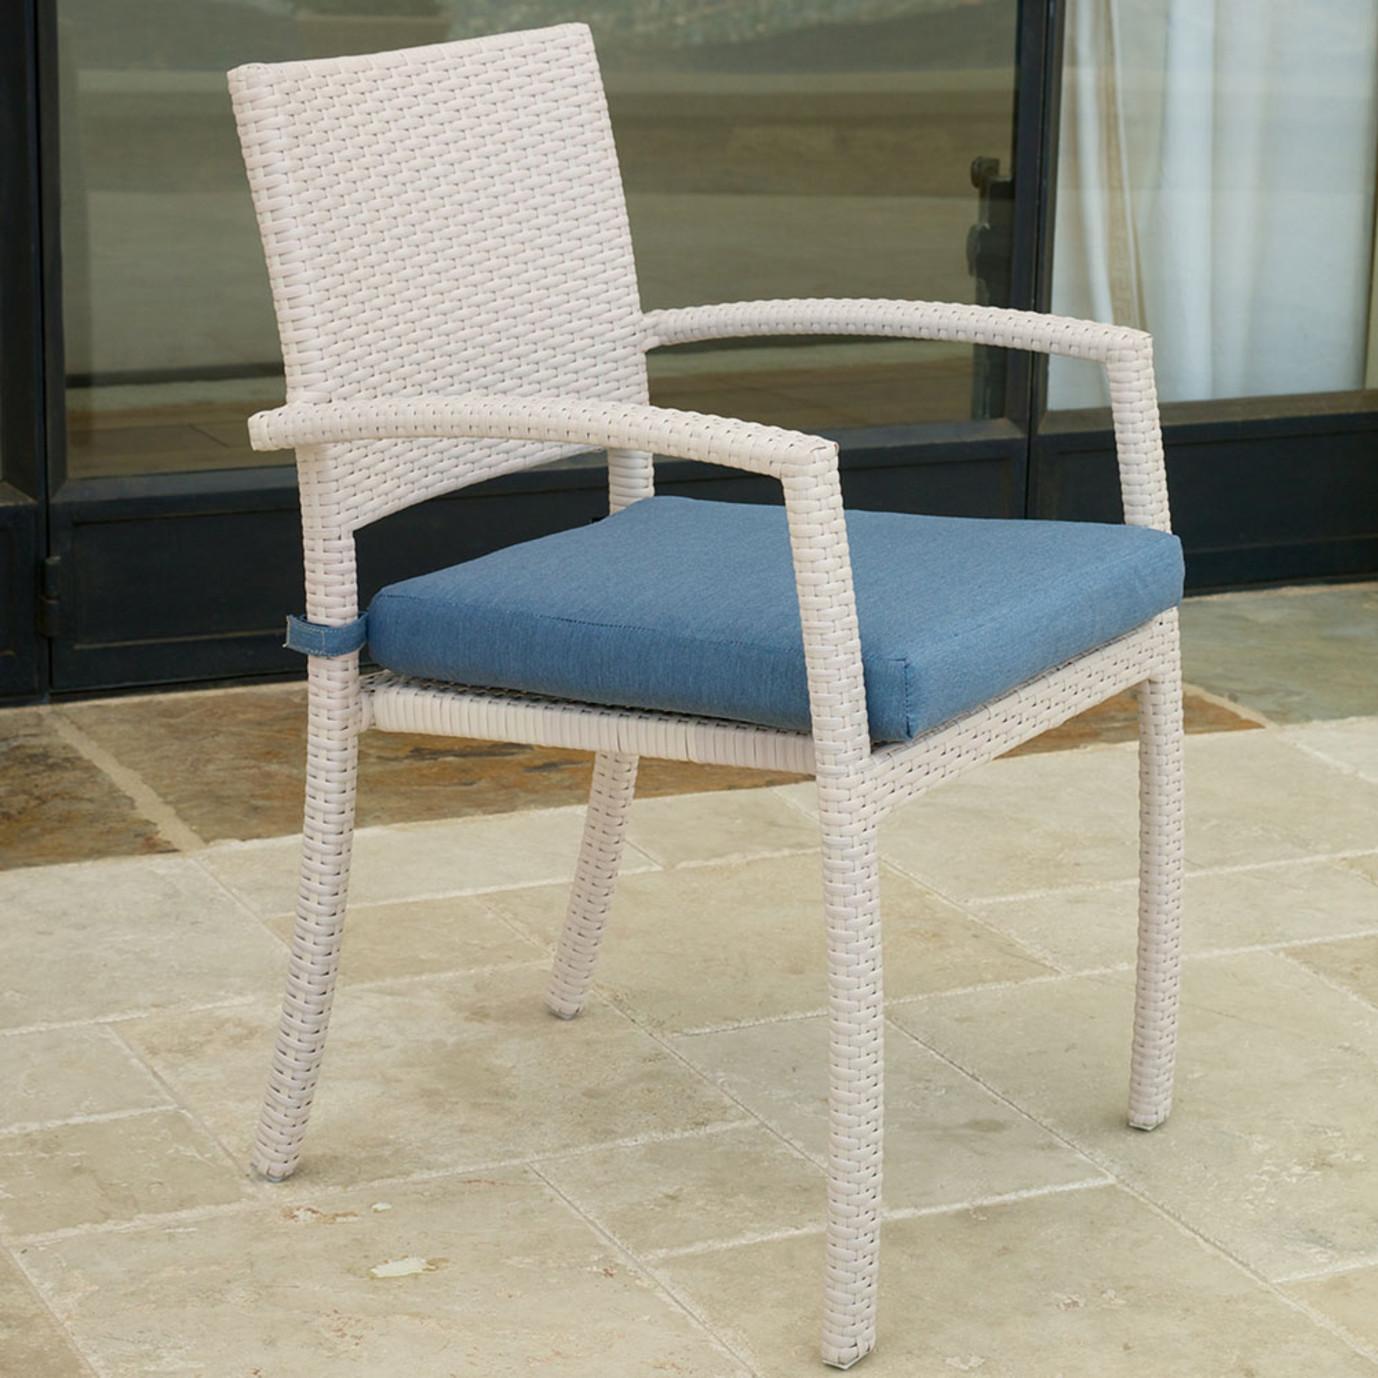 Portofino™ Comfort 6pk Dining Chairs - Newport Blue